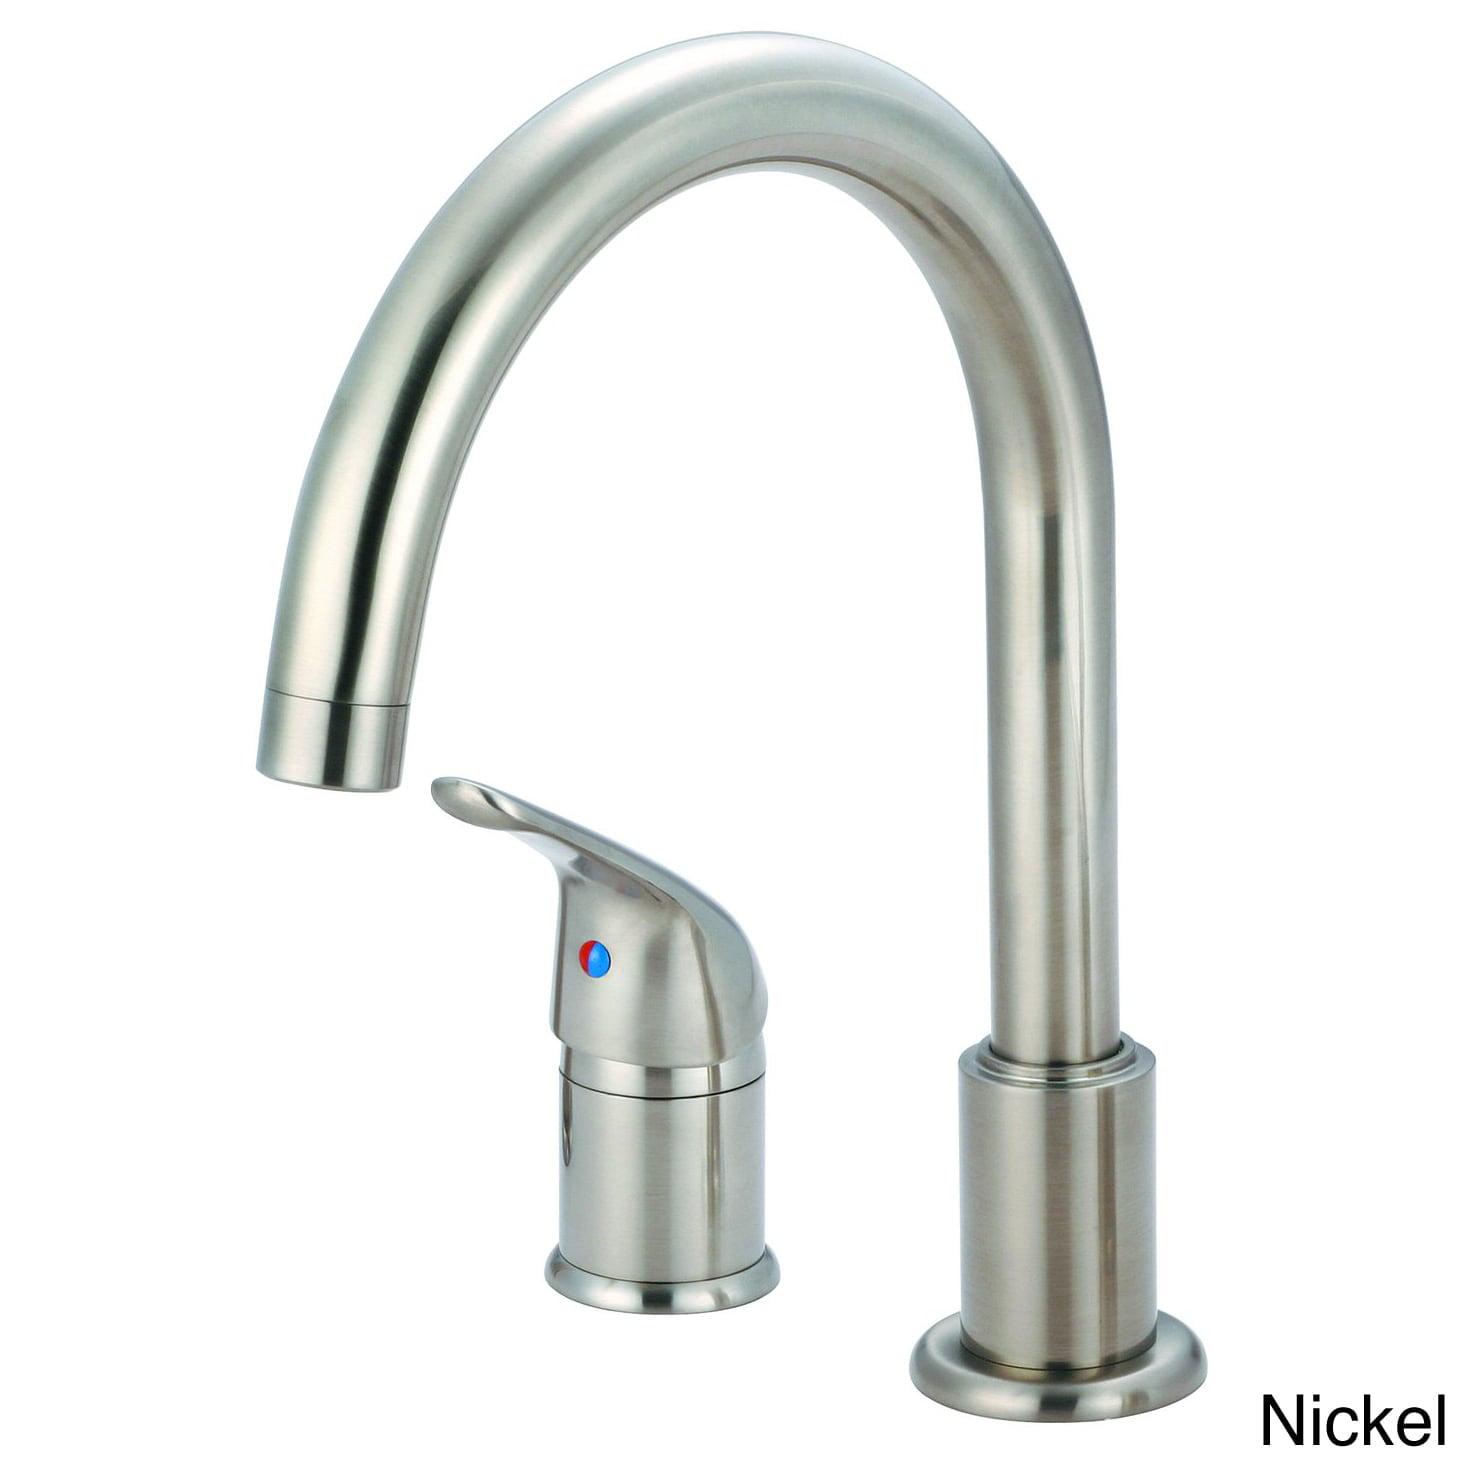 Kitchen Faucets Walmart: Pioneer Premium Series 2PM330 Single Handle Kitchen Faucet